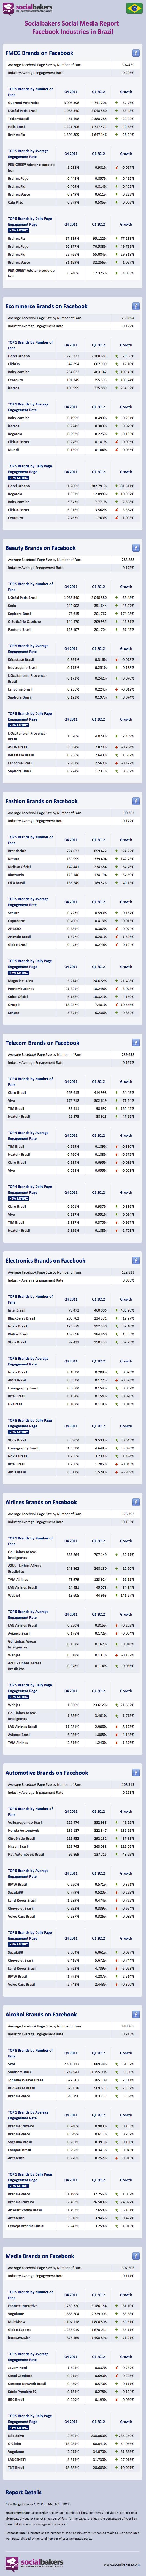 Social Media Brasil, primeiro quadrimestre de 2012 (2)